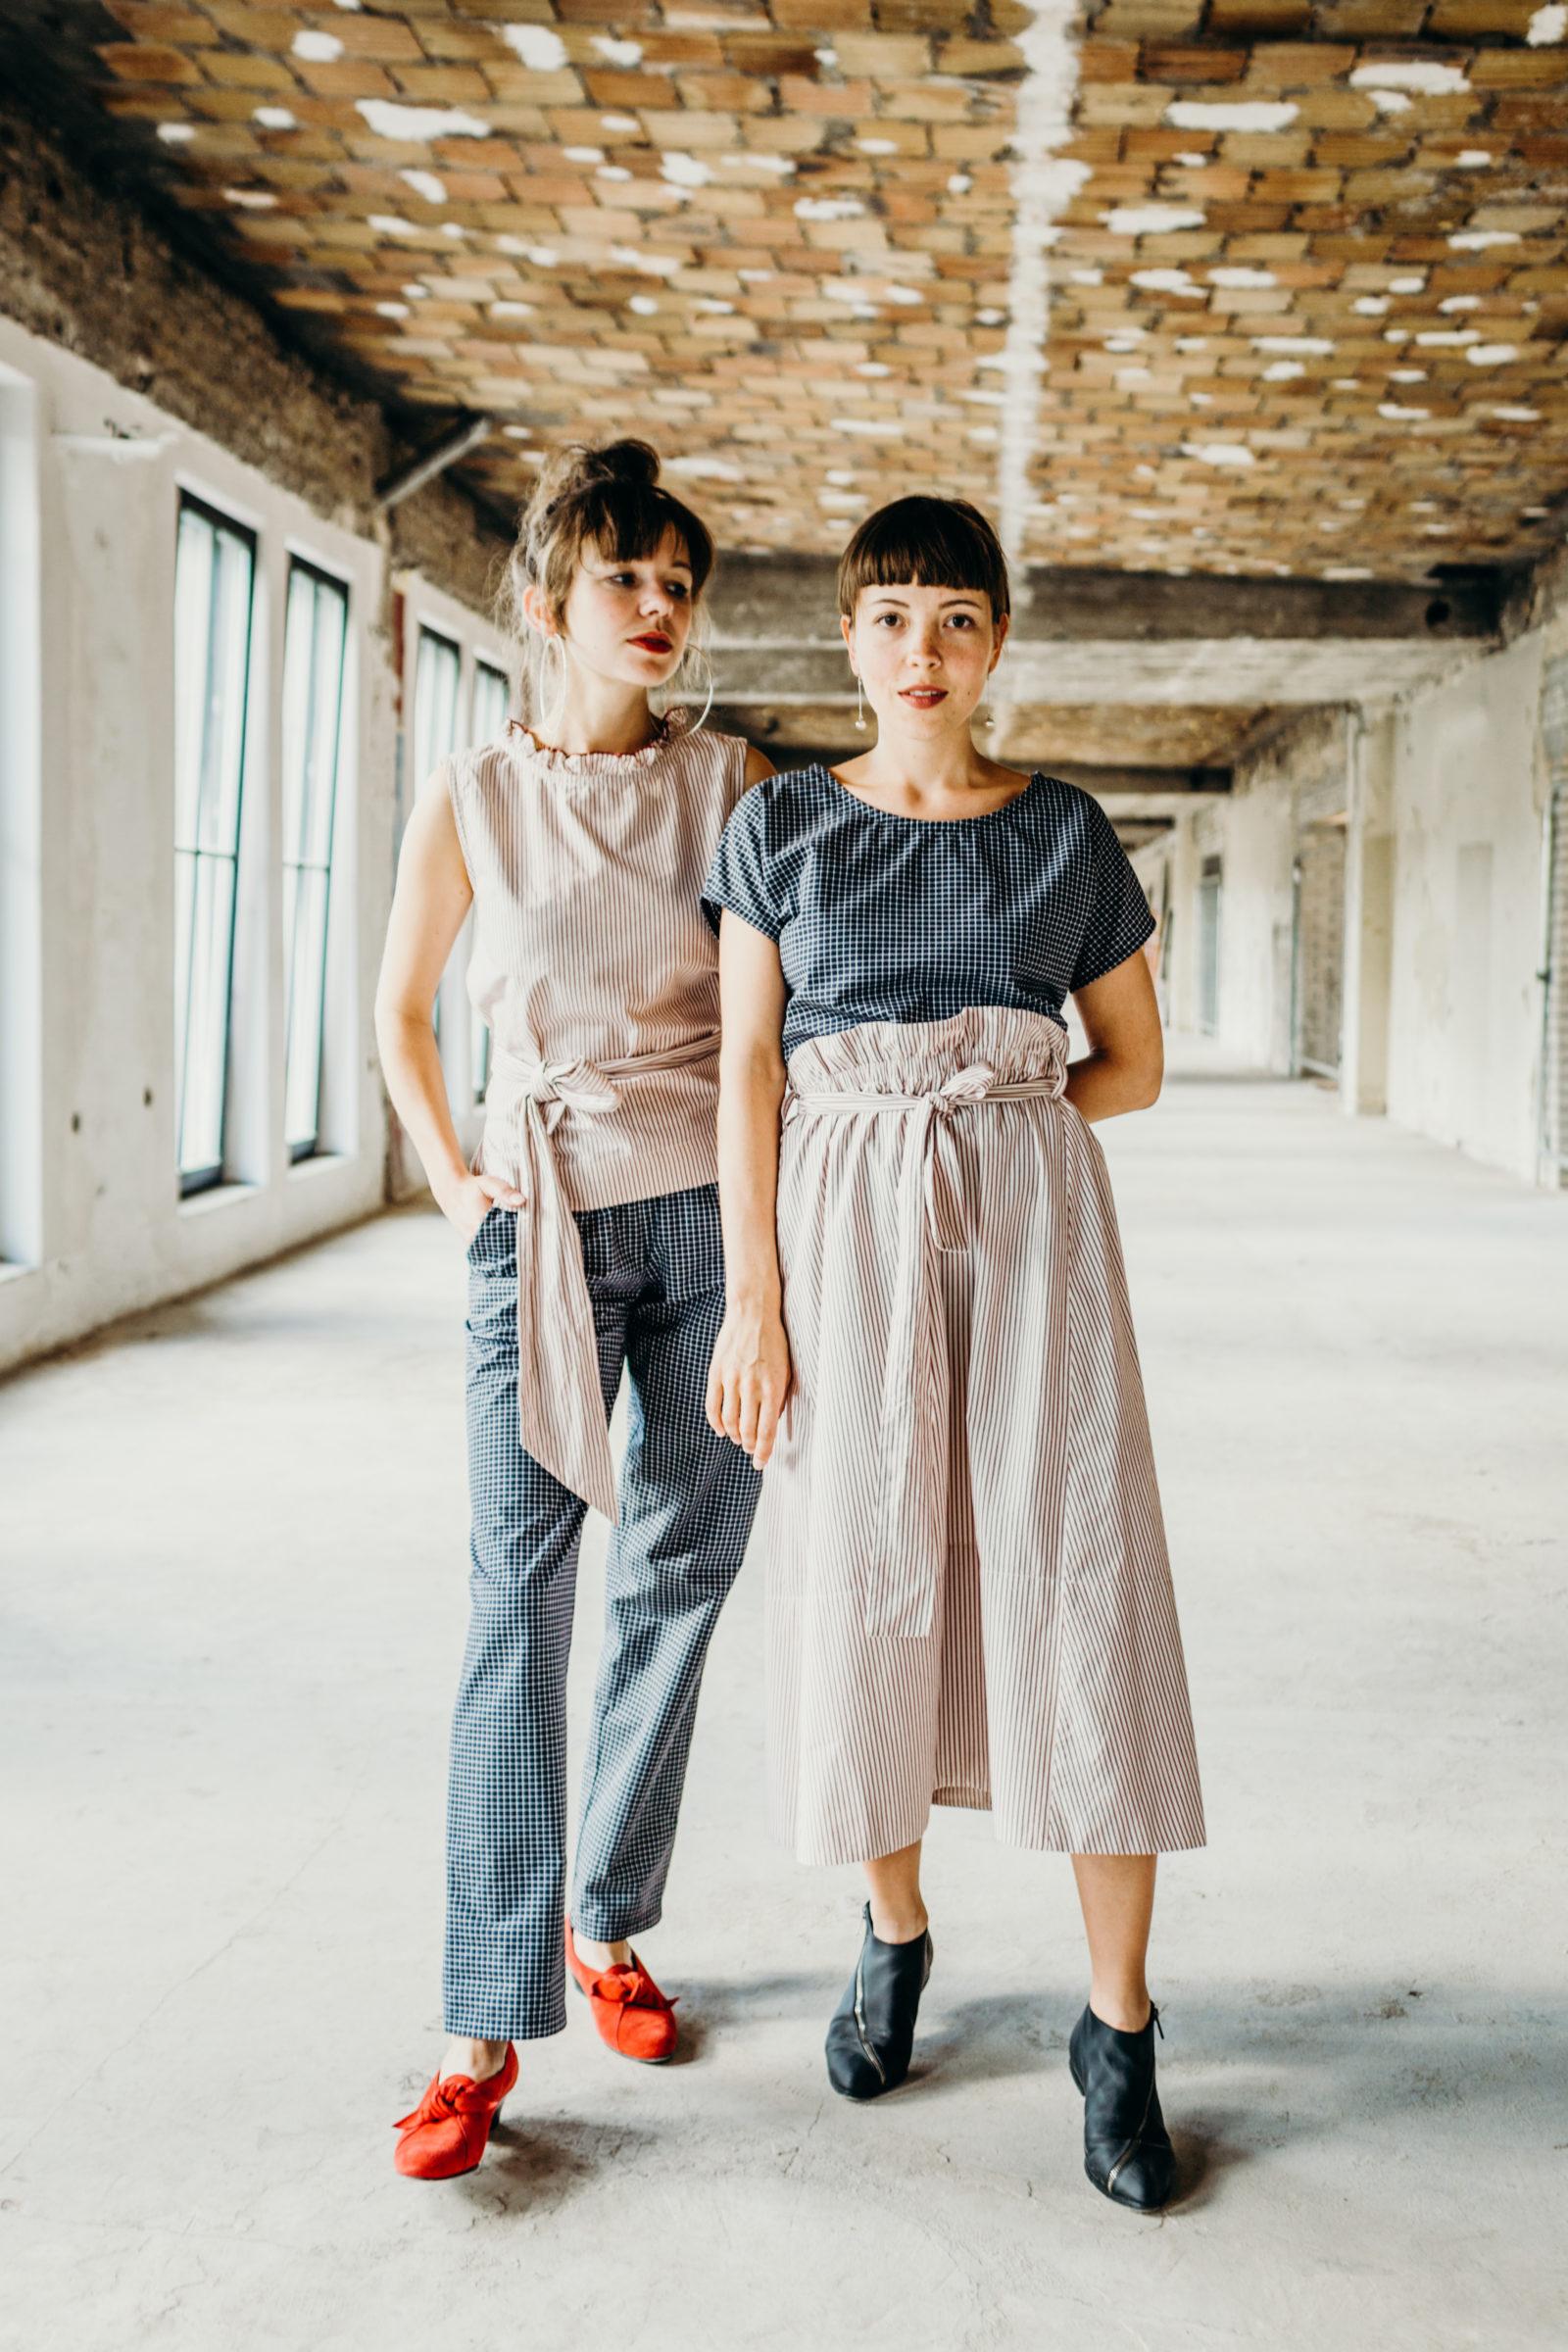 Fashion Changers x prePeek   Funkhaus Berlin   Ethical Fashion Show & Greenshowroom   Foto: Lydia Hersberger   GROSS∆RTIG